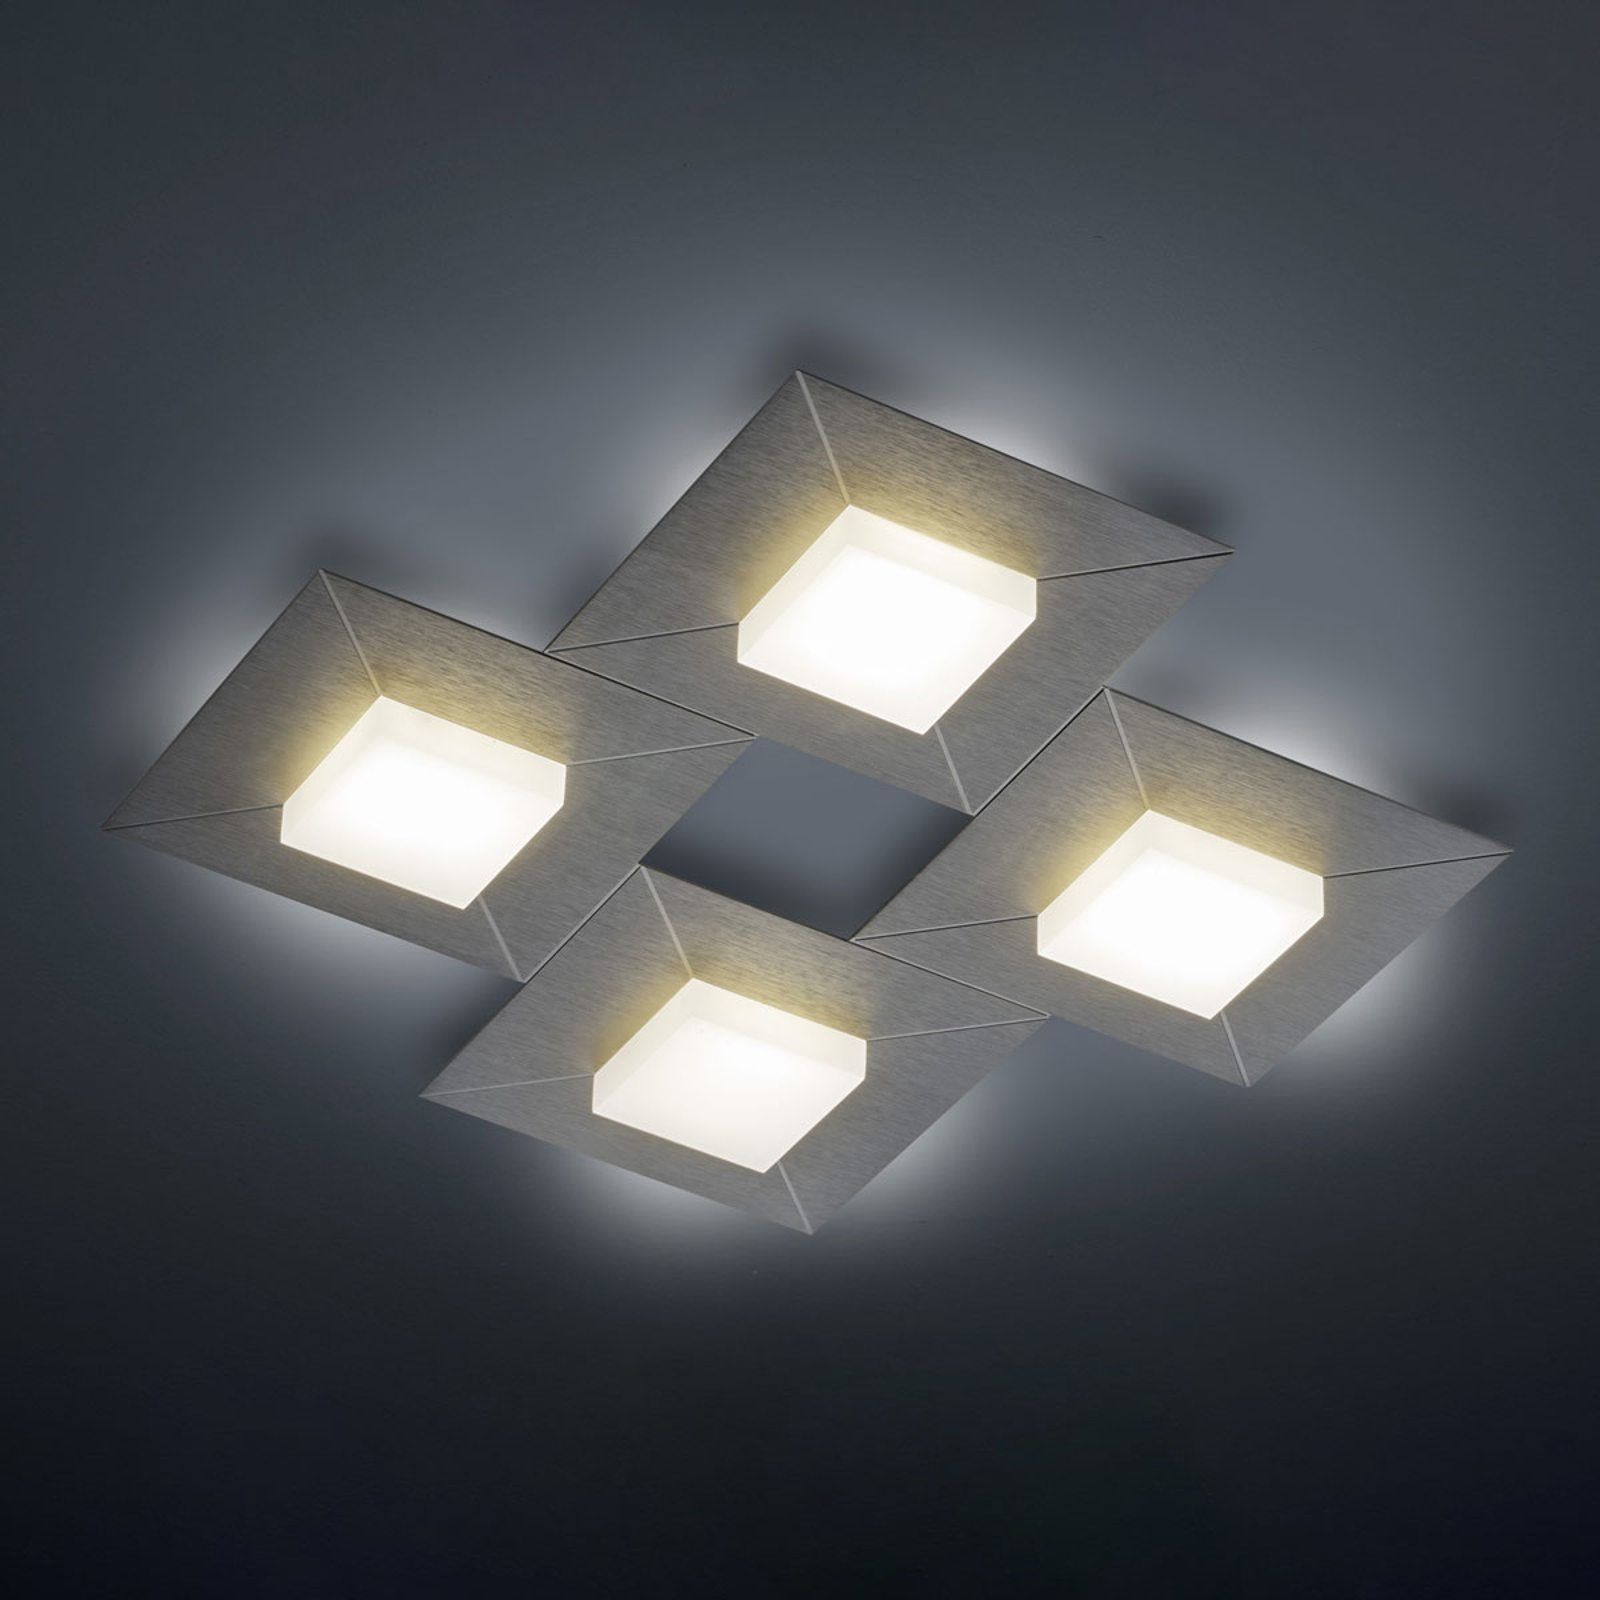 BANKAMP Diamond lampa sufitowa 42x42cm, antracyt